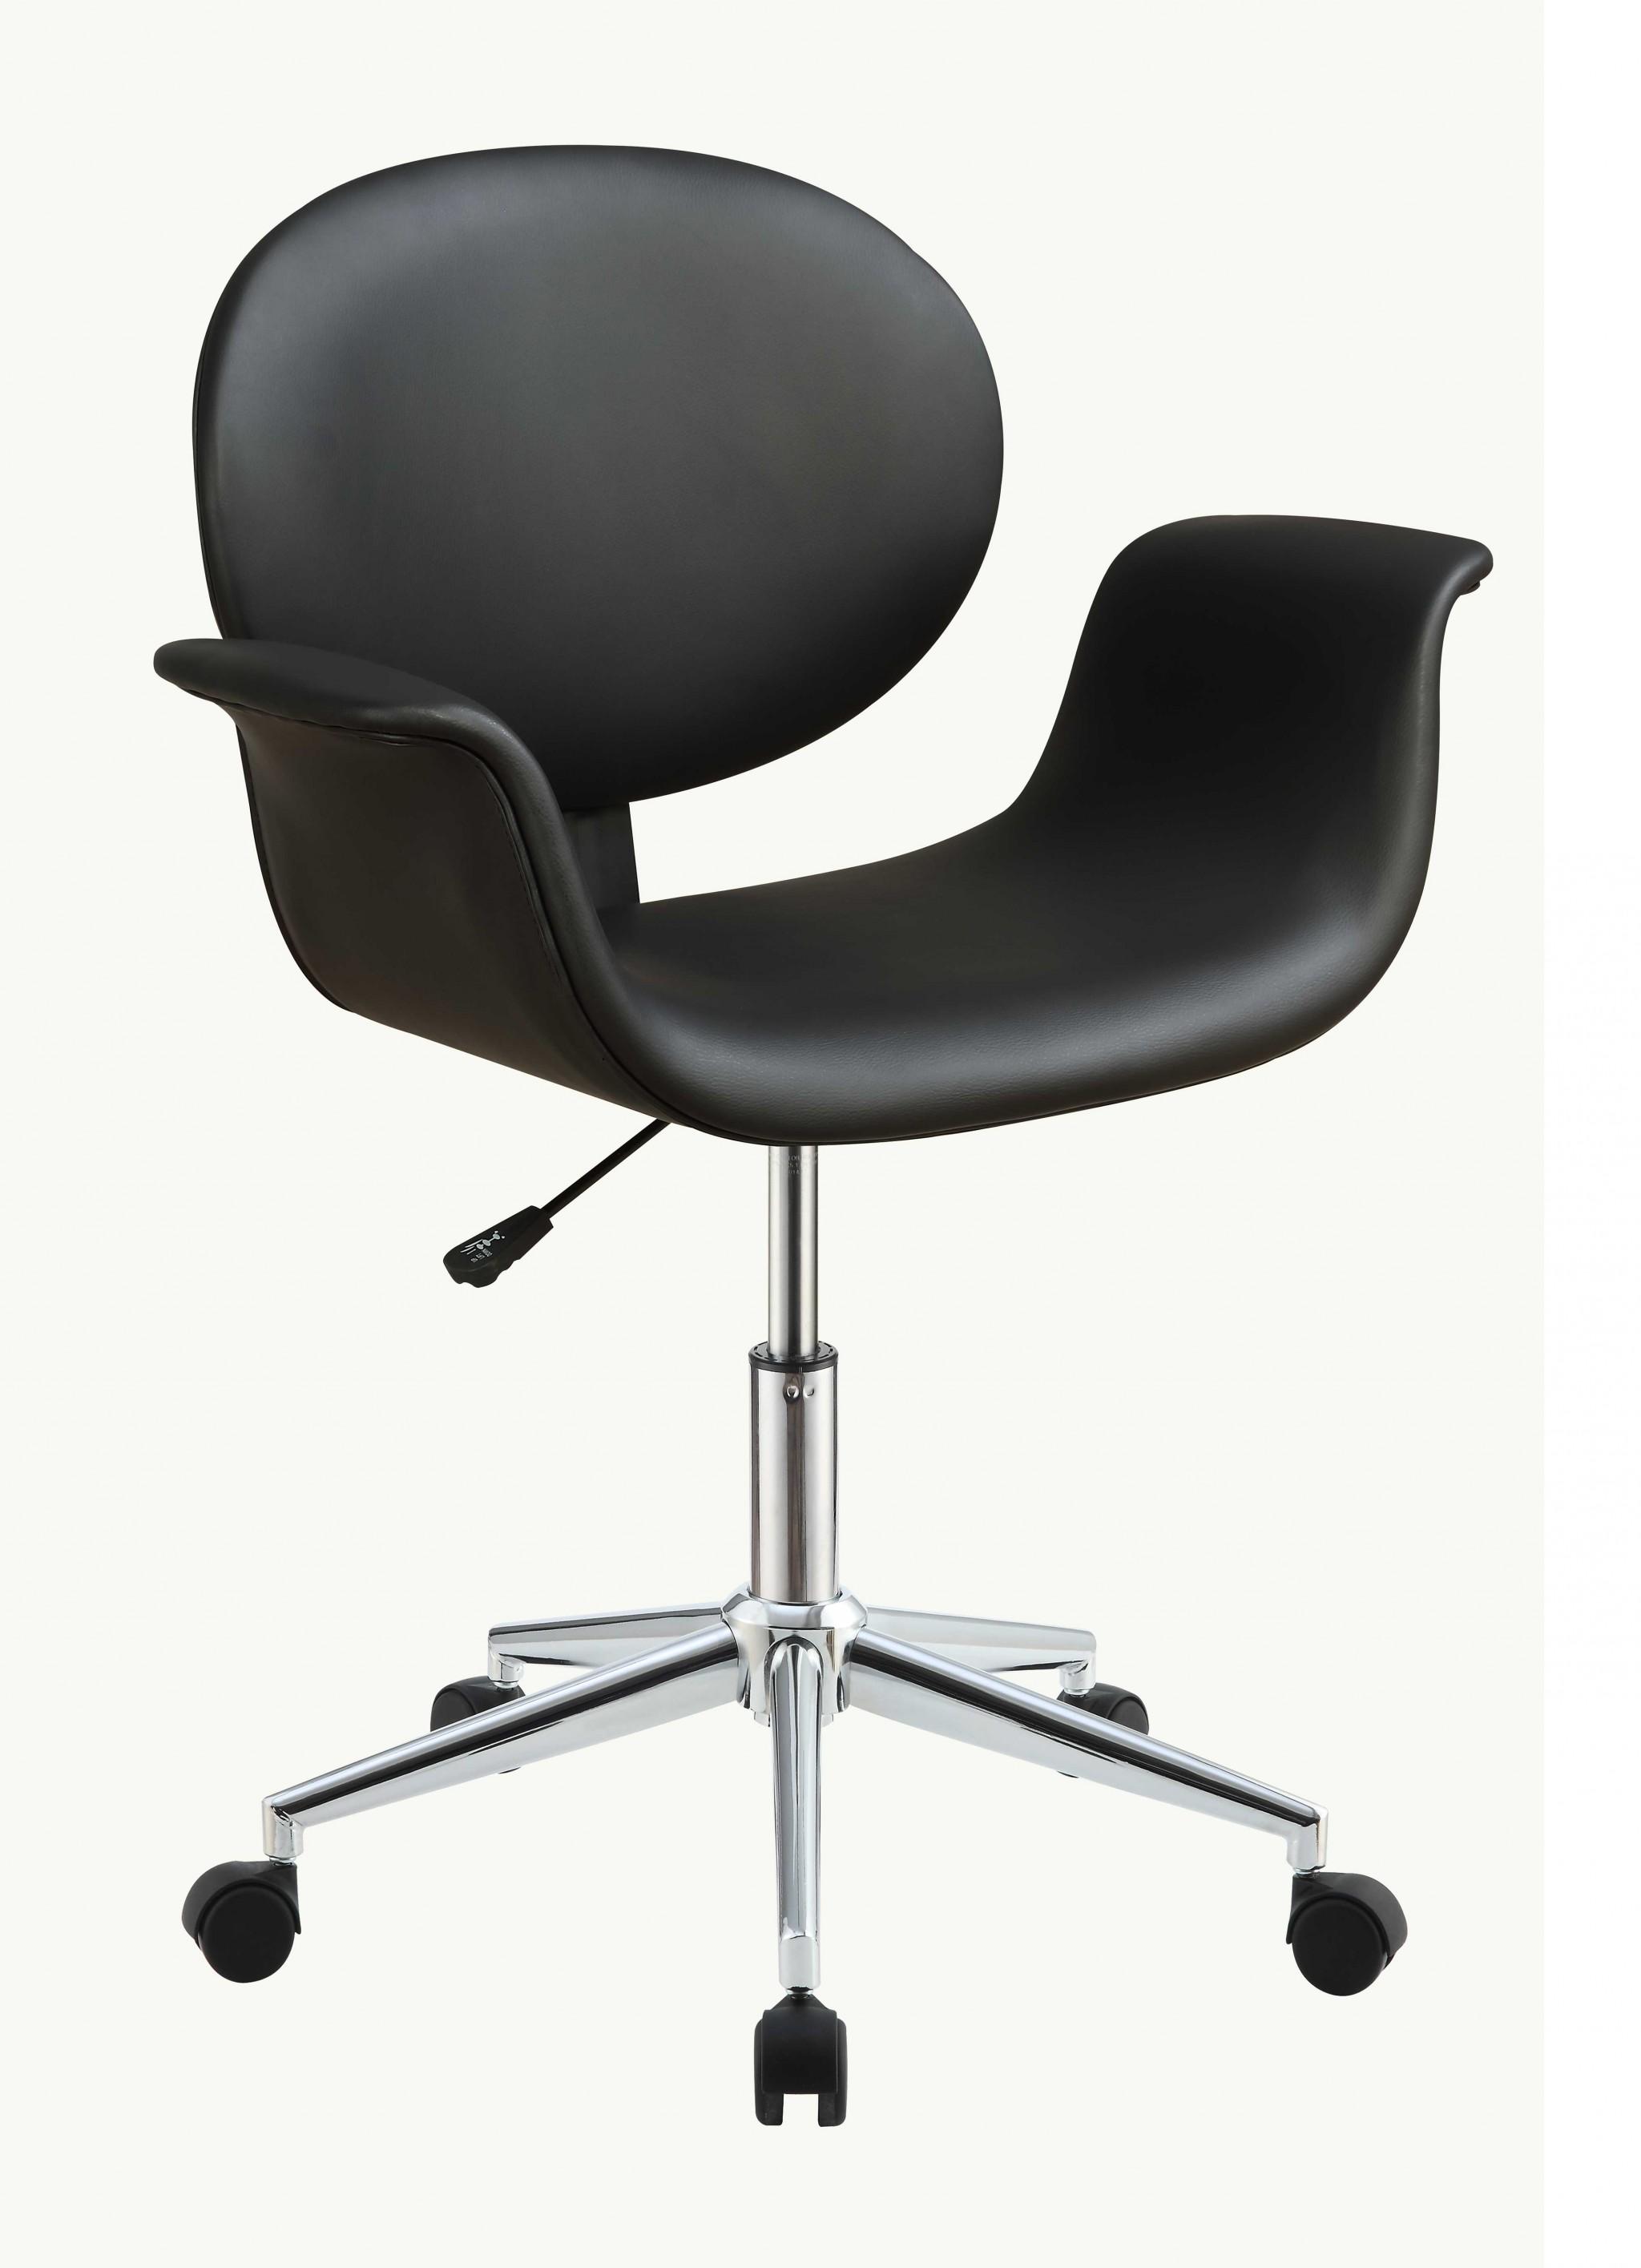 "27"" X 24"" X 34"" Black Pu Office Chair"